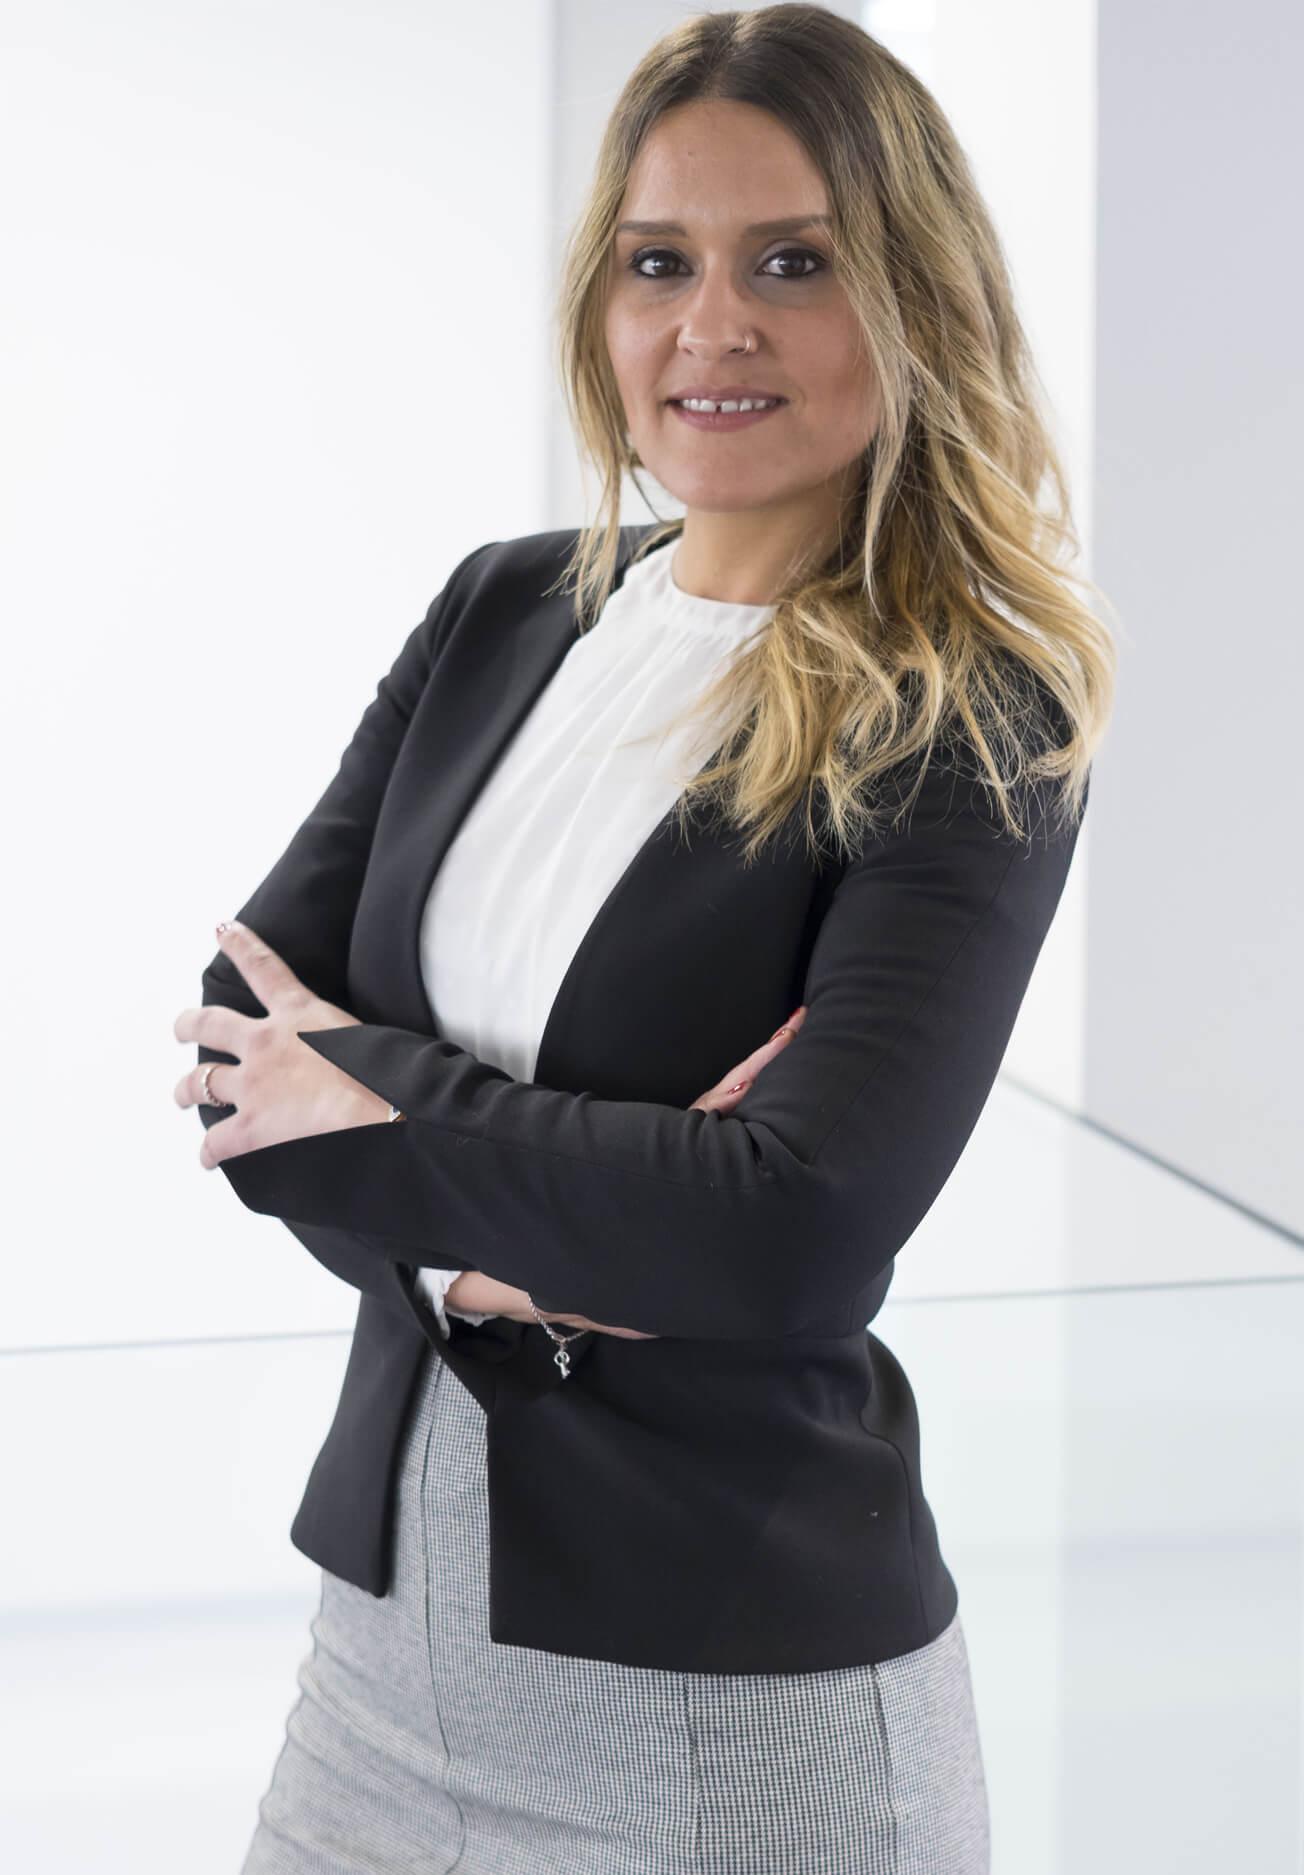 Alejandra Siegrist